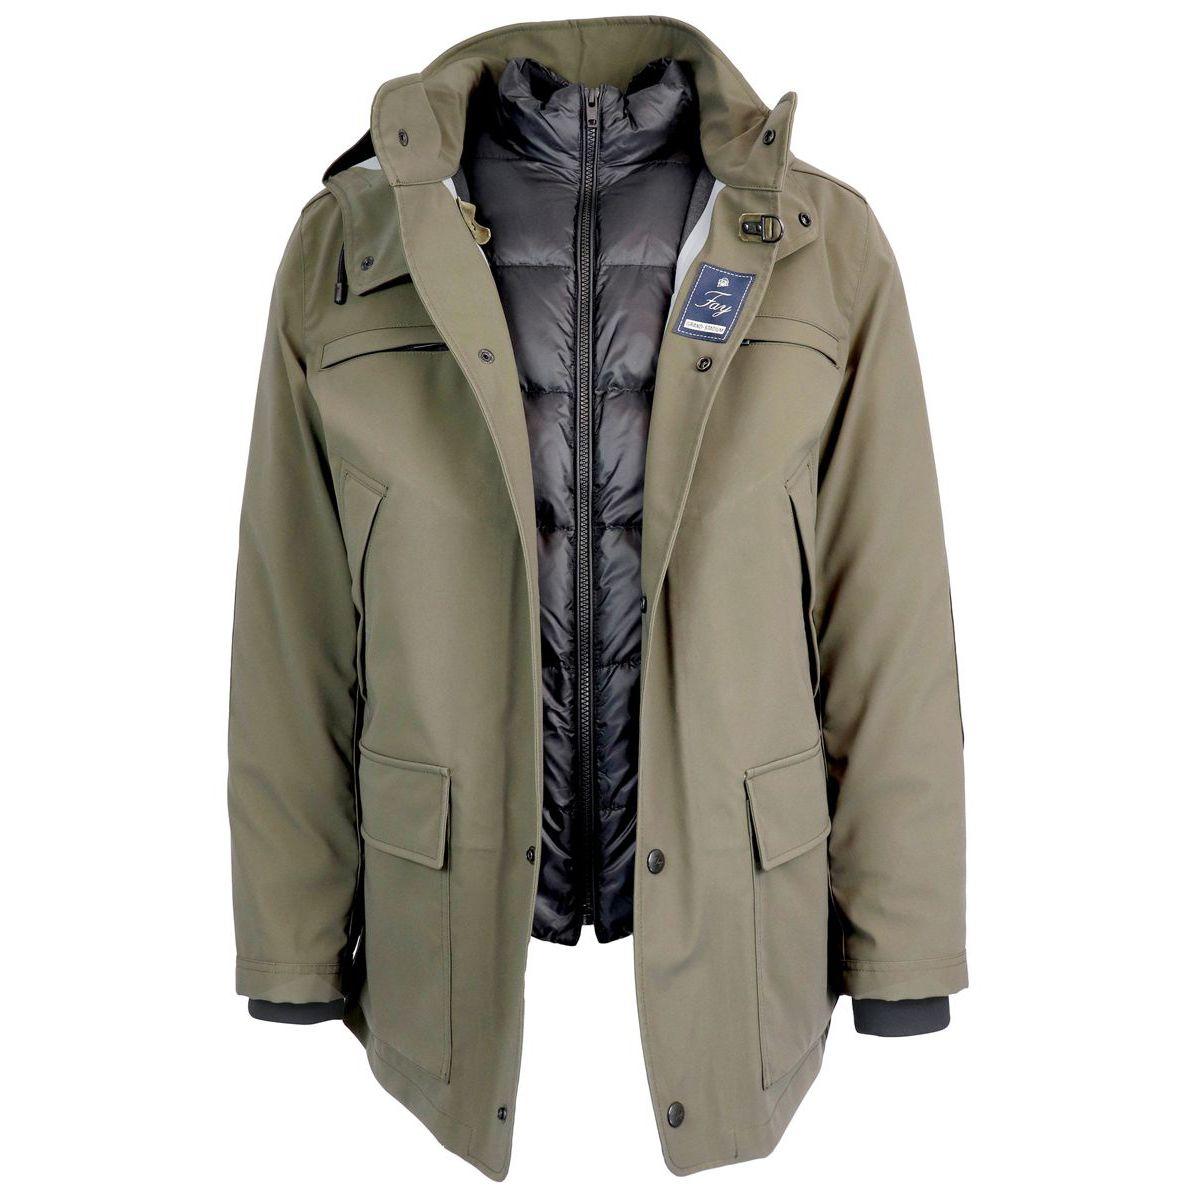 buy popular 7fb5b 76553 NEW GRAND STADIUM waterproof layered jacket